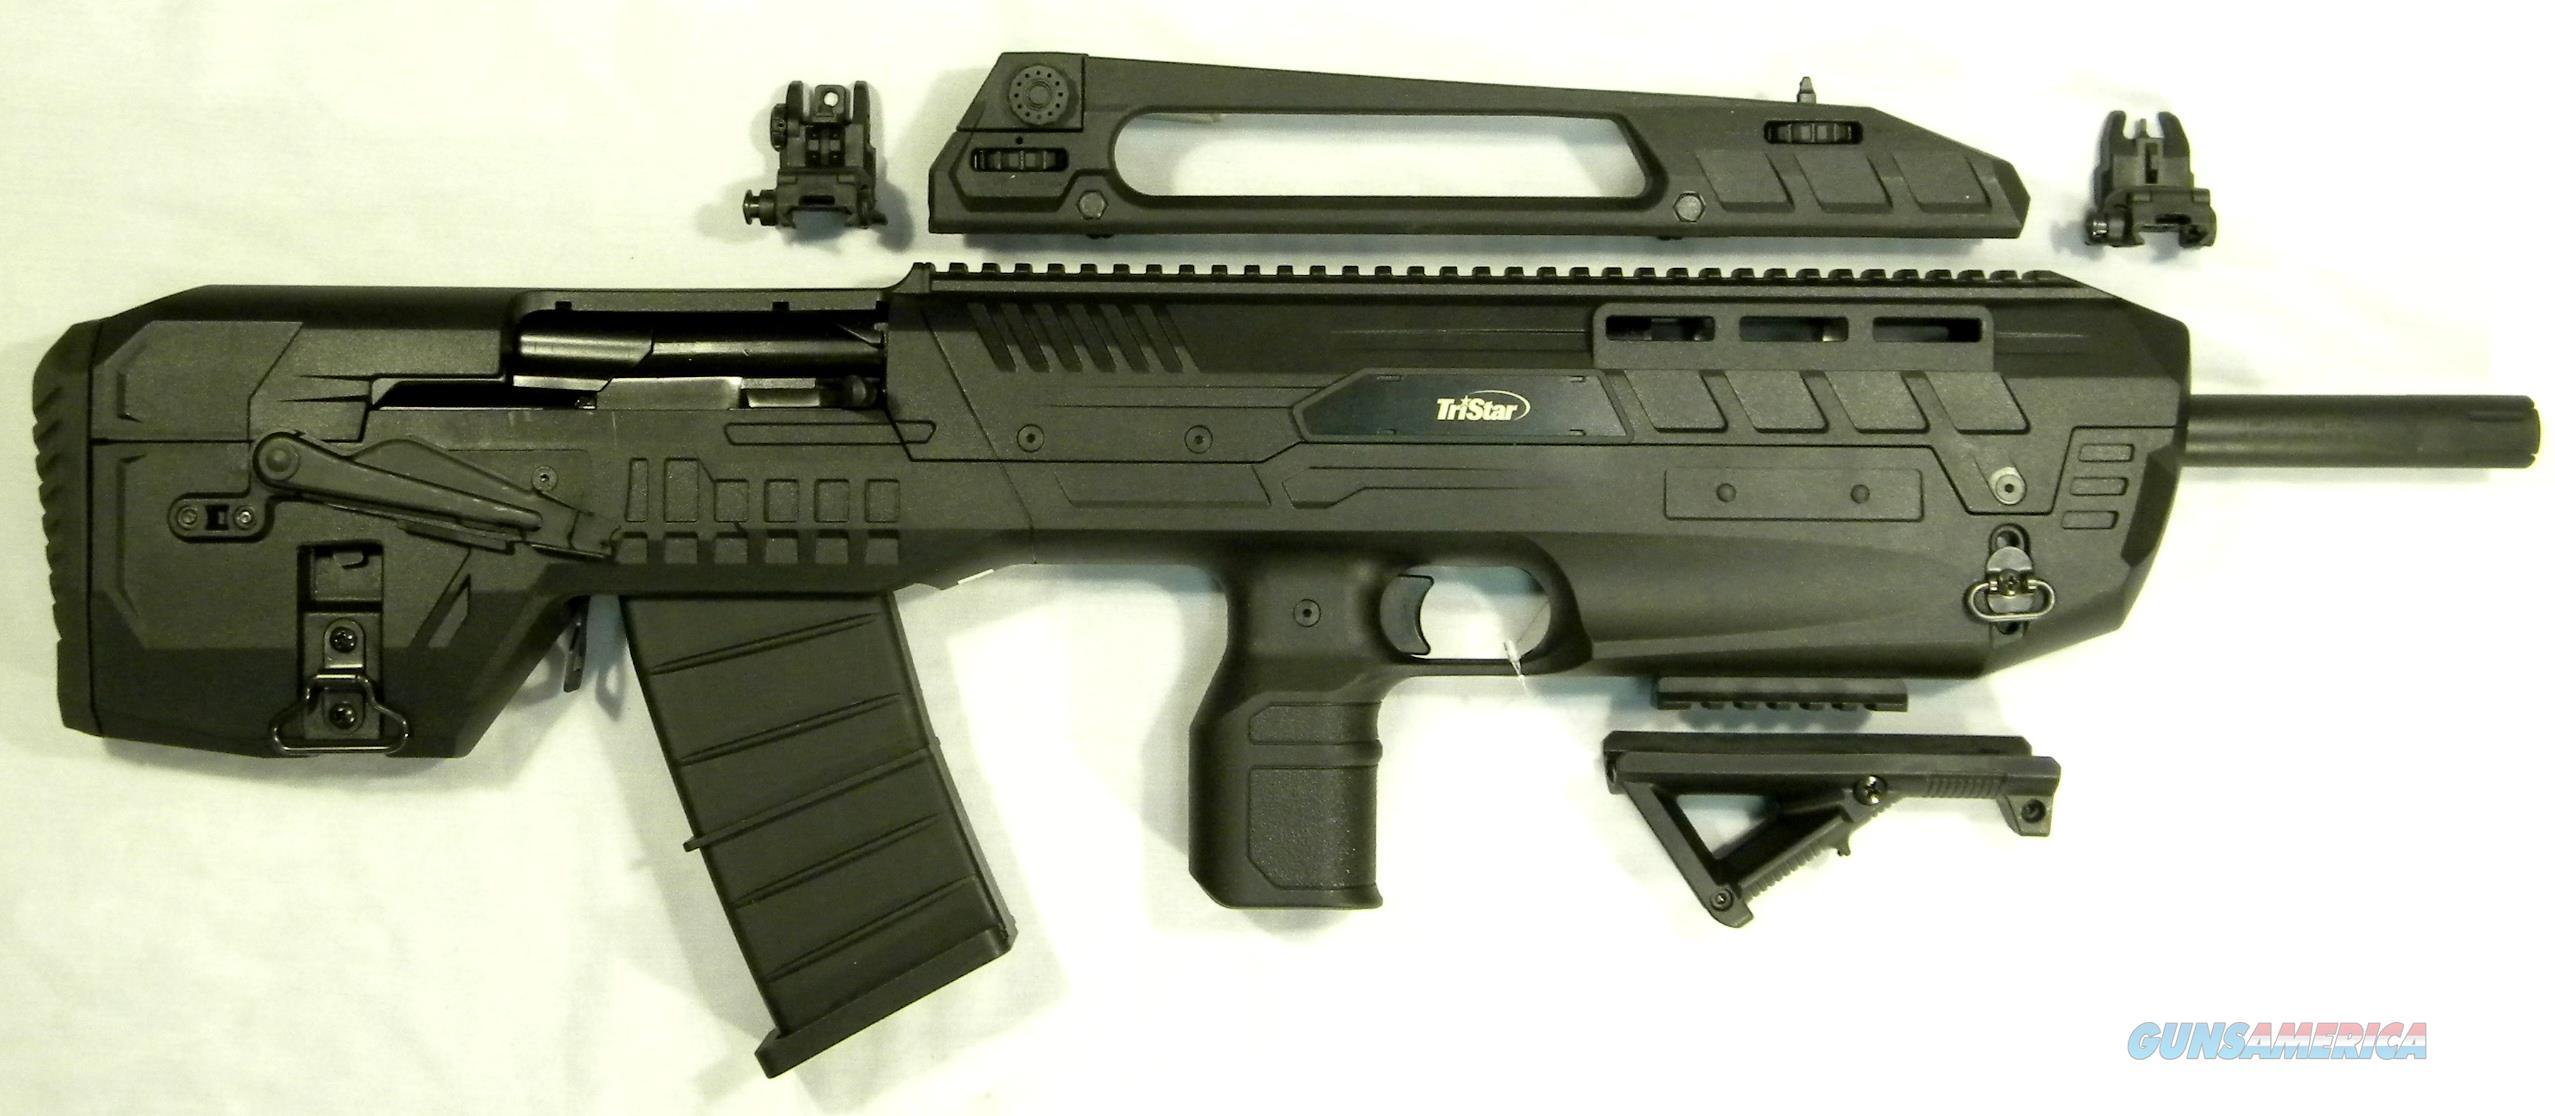 "TriStar ""Compact"", 12 Gauge Semi-Auto Bull-Pup Shotgun, New In Box  Guns > Shotguns > Tristar Shotguns"